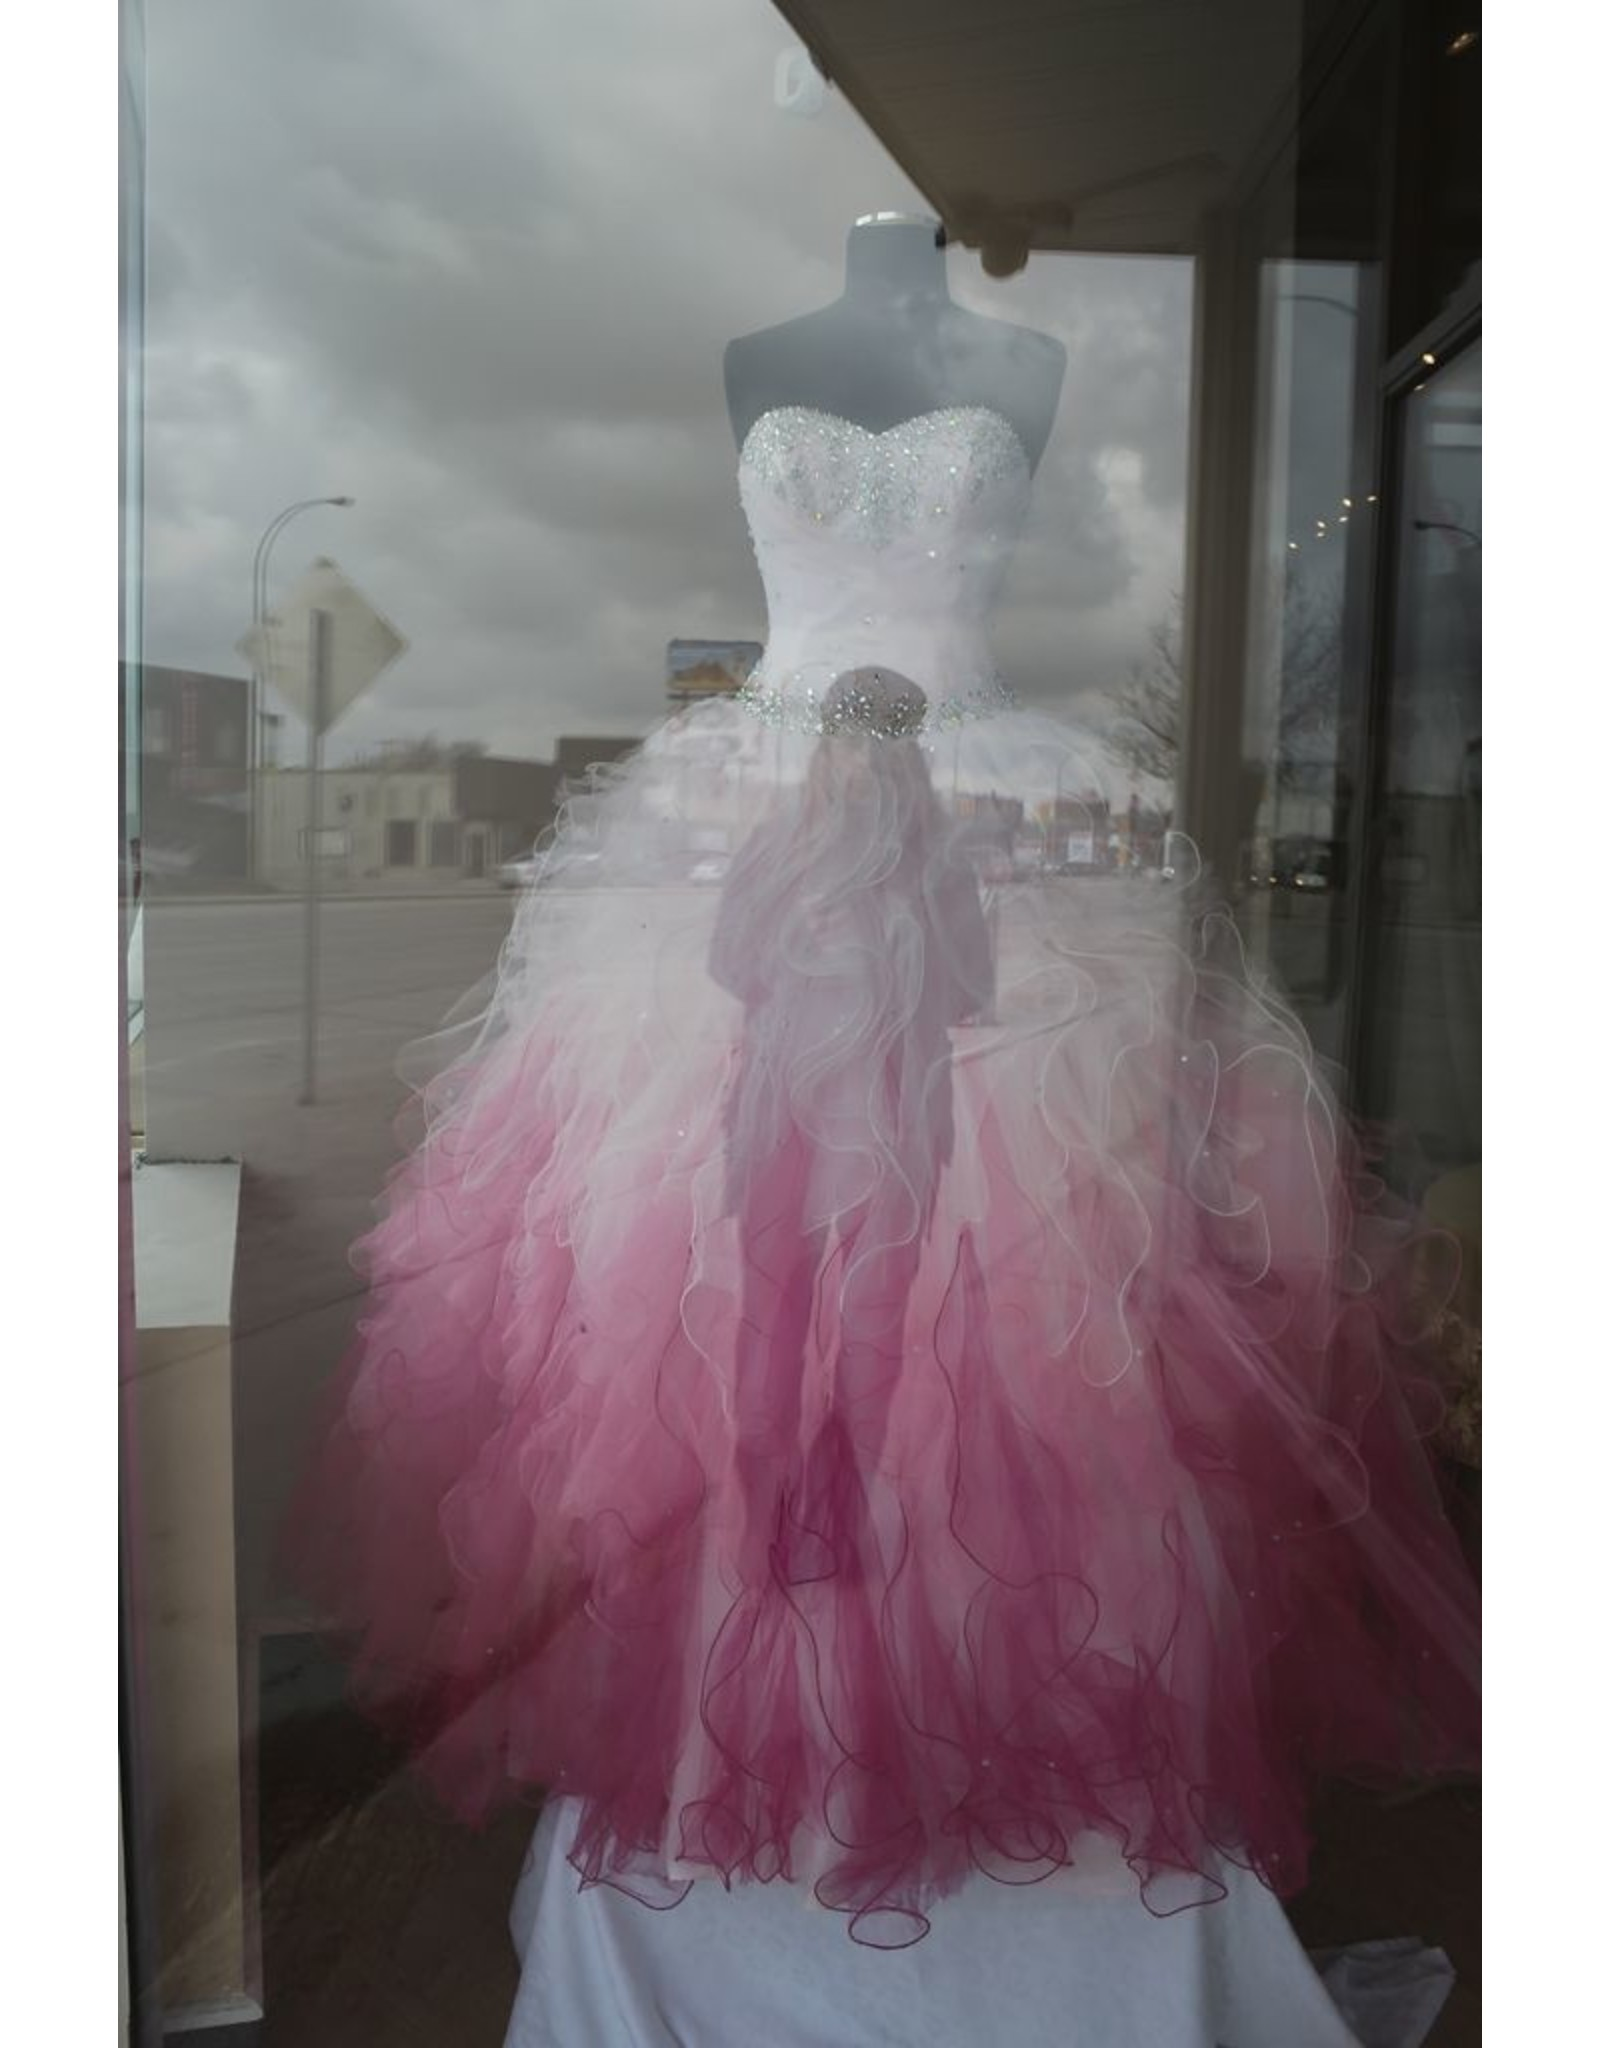 LeBlanc, Marie Red Dress, Marie LeBlanc